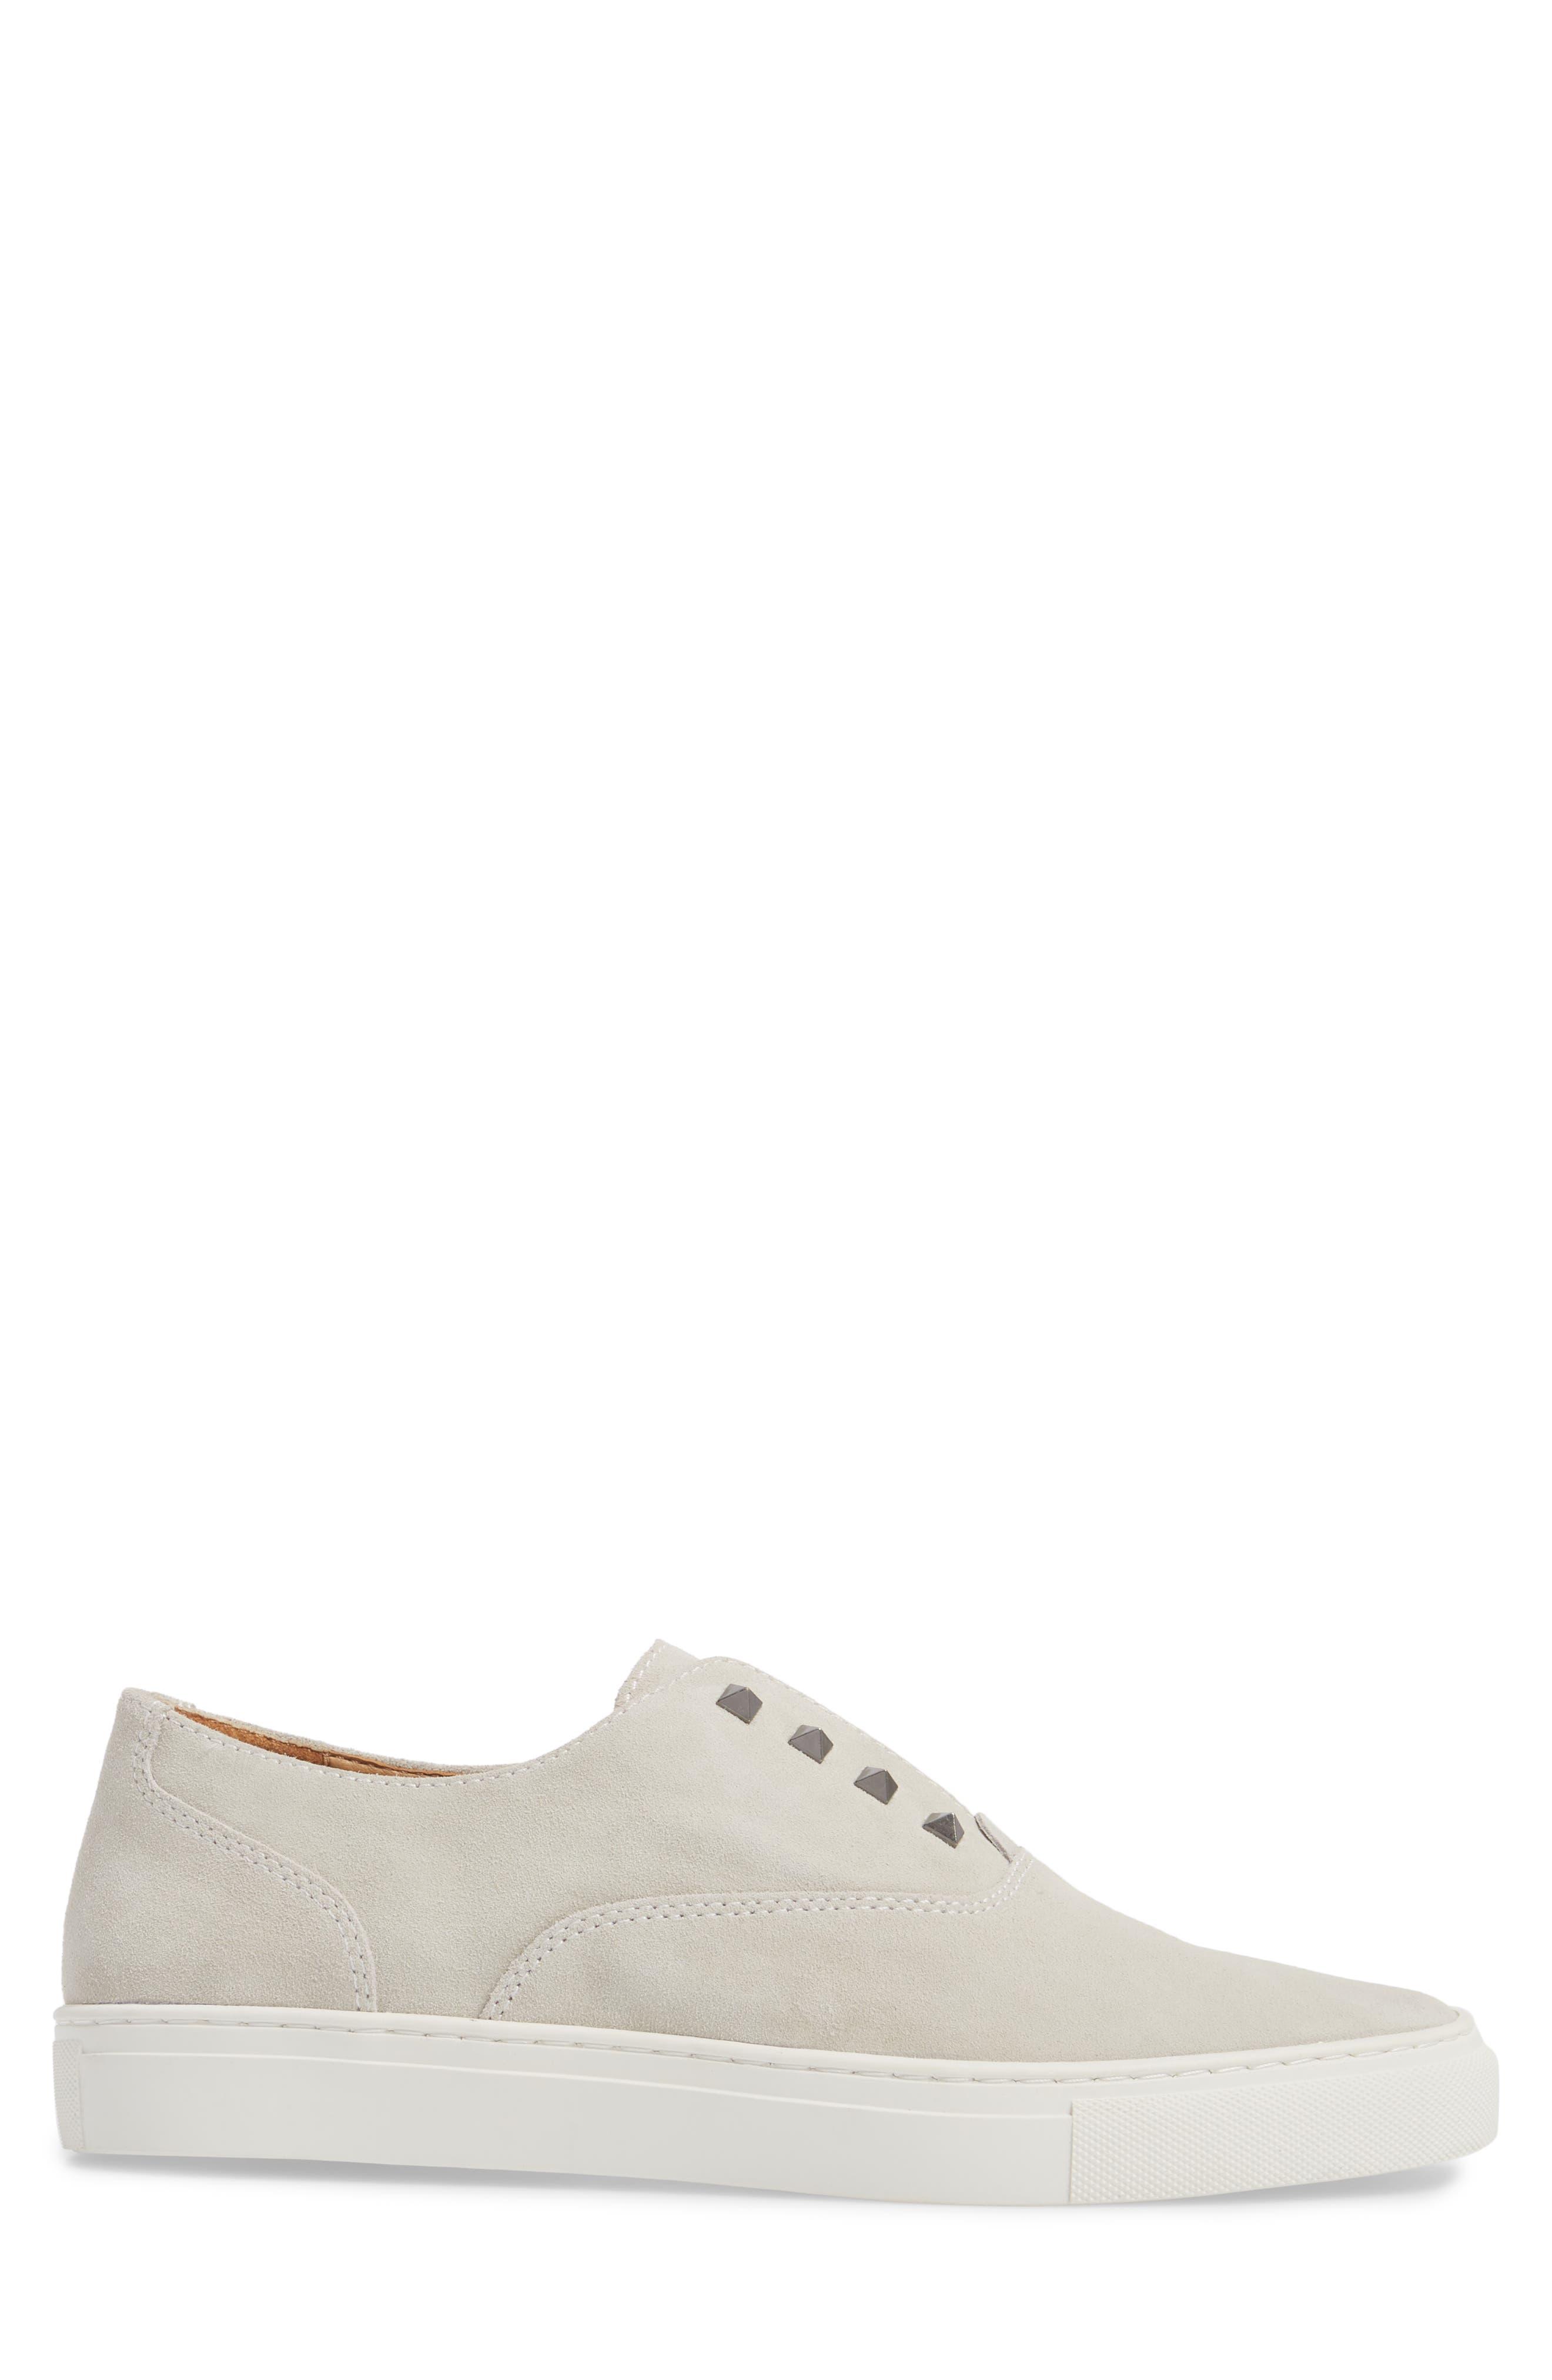 Aryo Studded Laceless Sneaker,                             Alternate thumbnail 5, color,